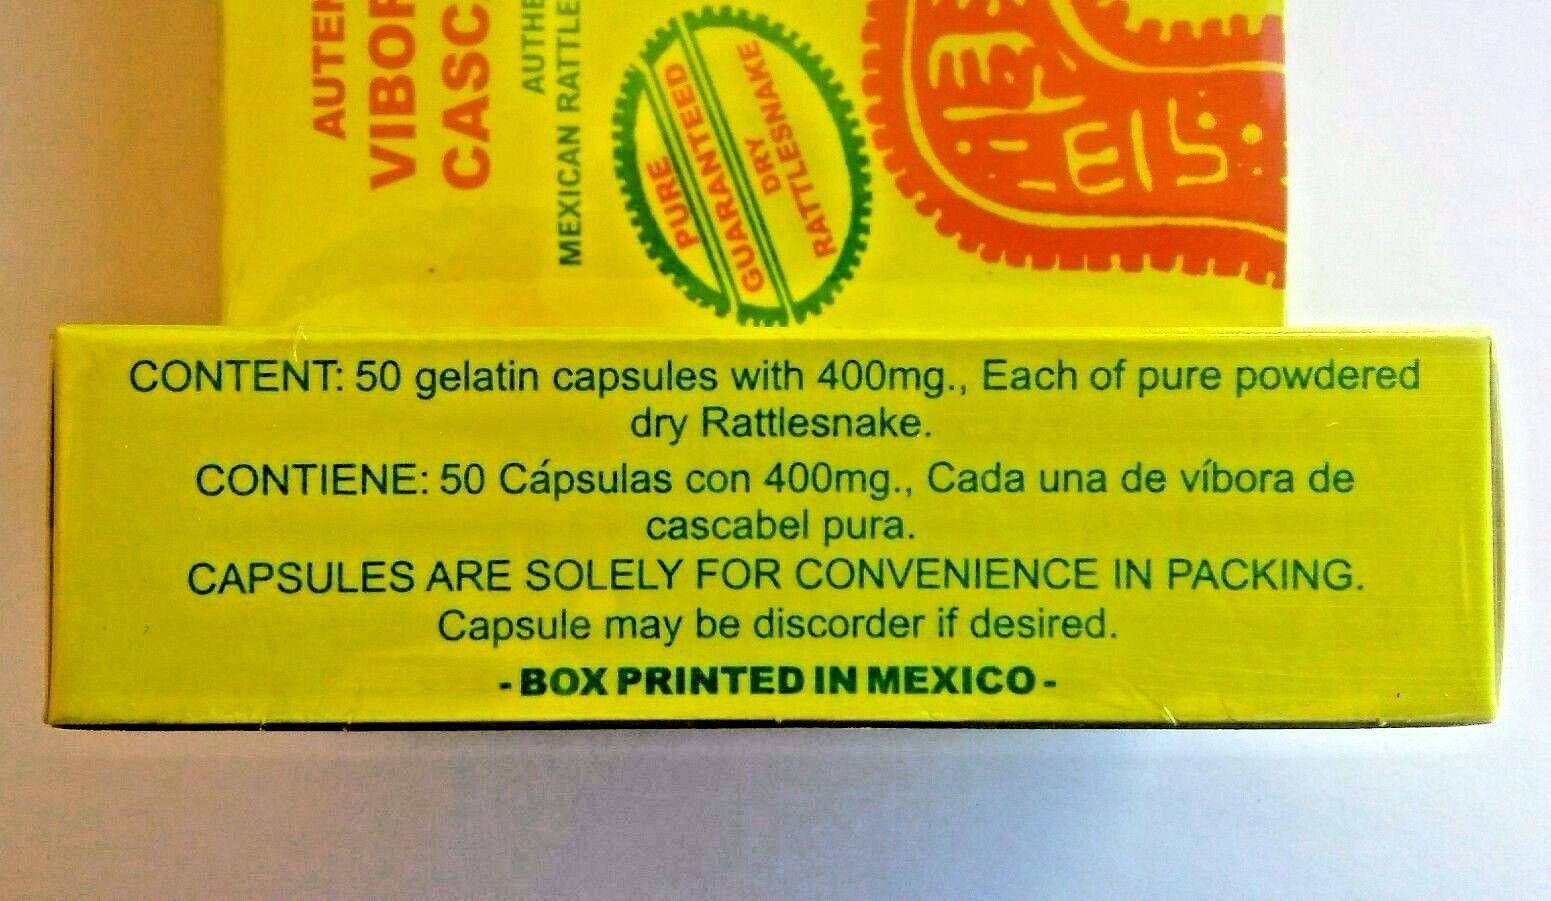 3 Rattlesnake Vibora de Cascabel 150 Capsules + 3 Jabon Vibora Cascabel 4.93 oz 9